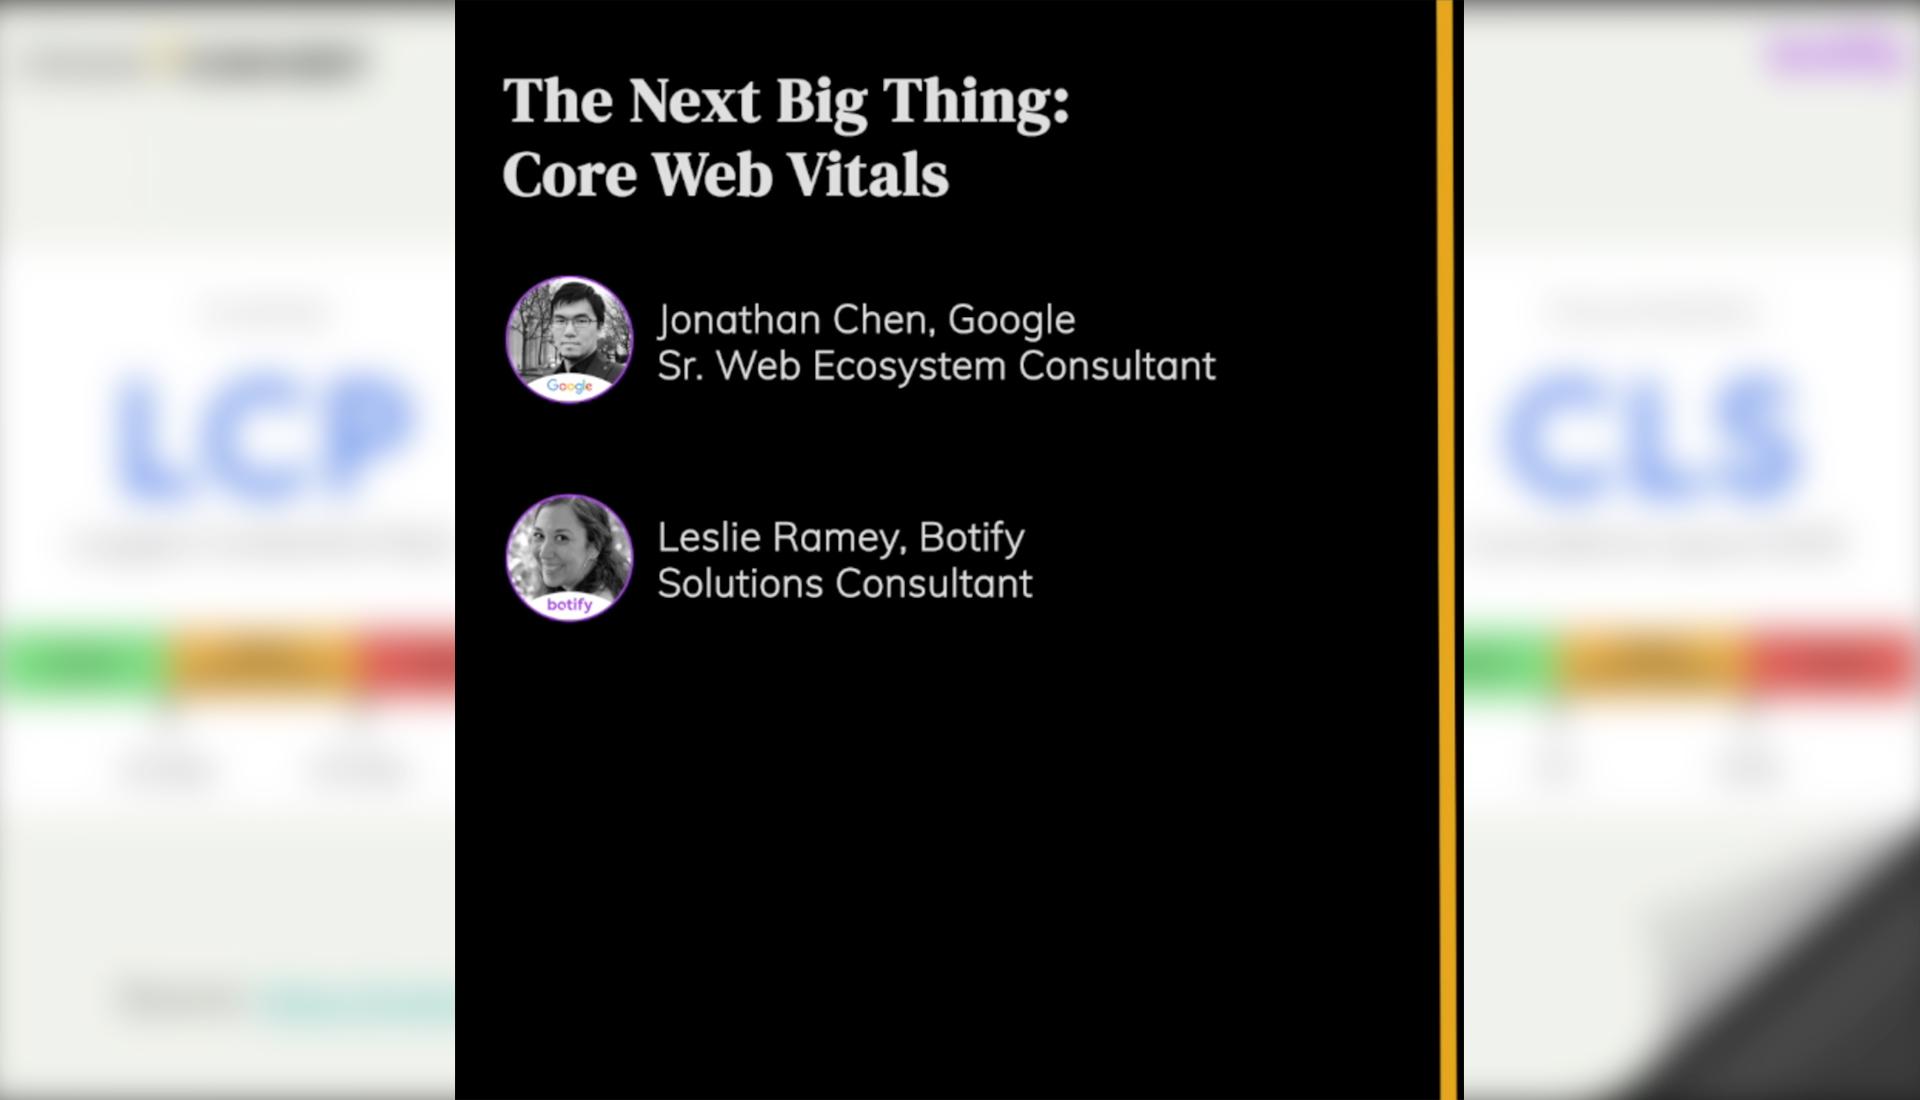 The Next Big Thing: Core Web Vitals